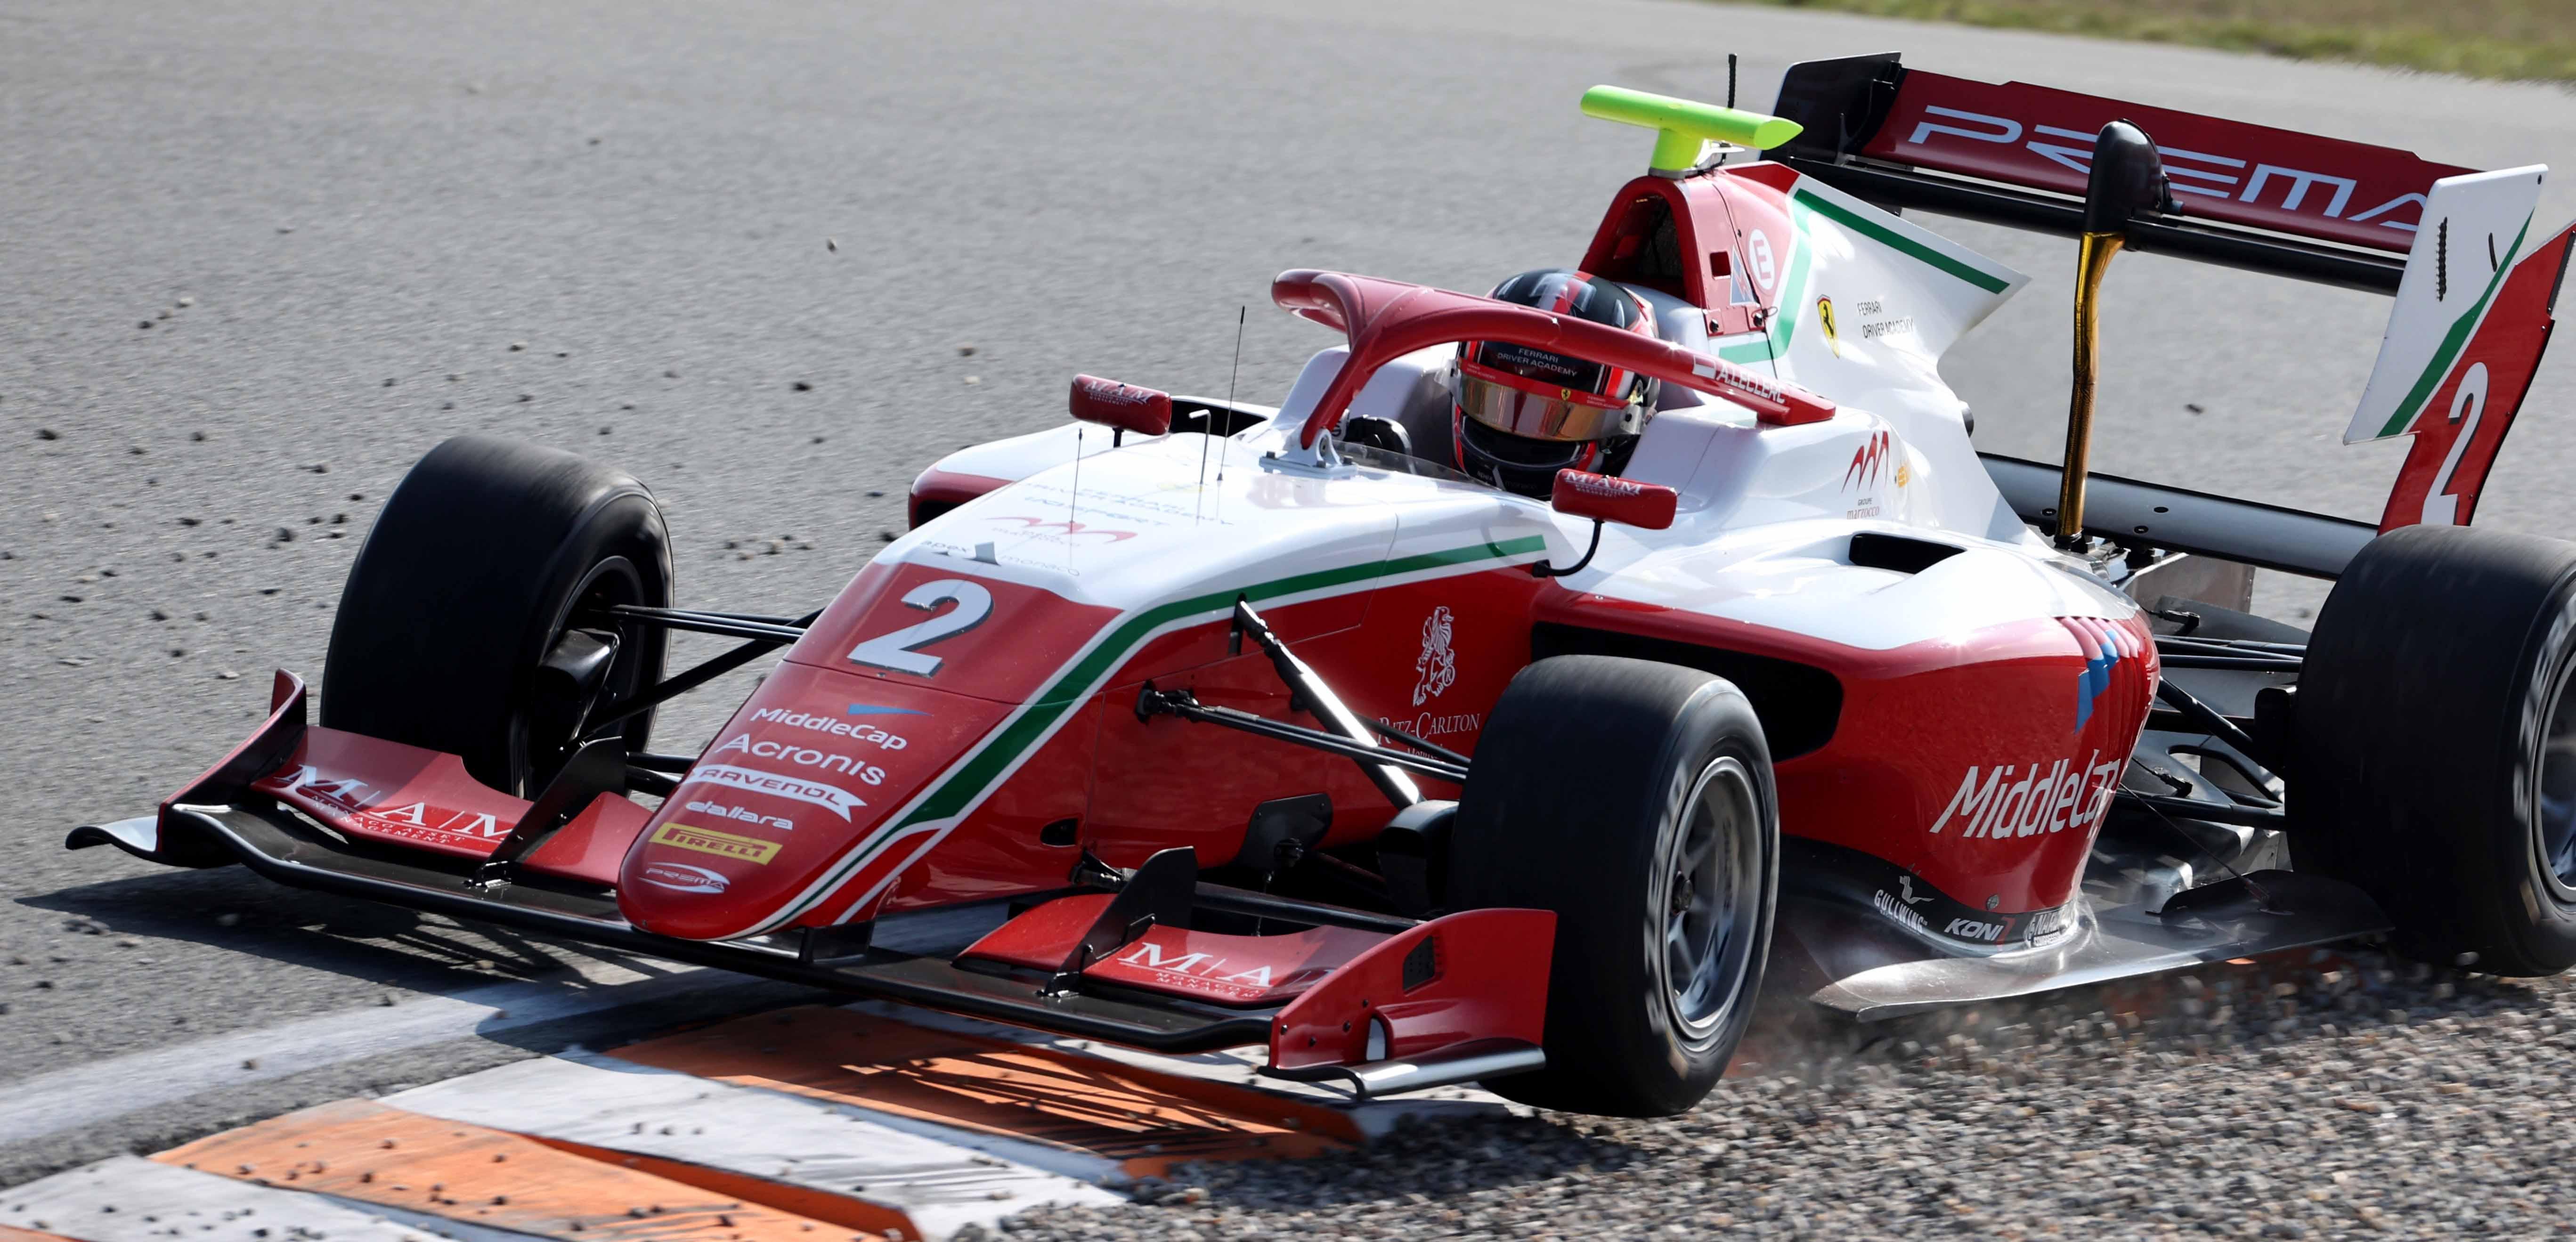 Zandvoort - Gara 1<br />Leclerc contiene Sargeant